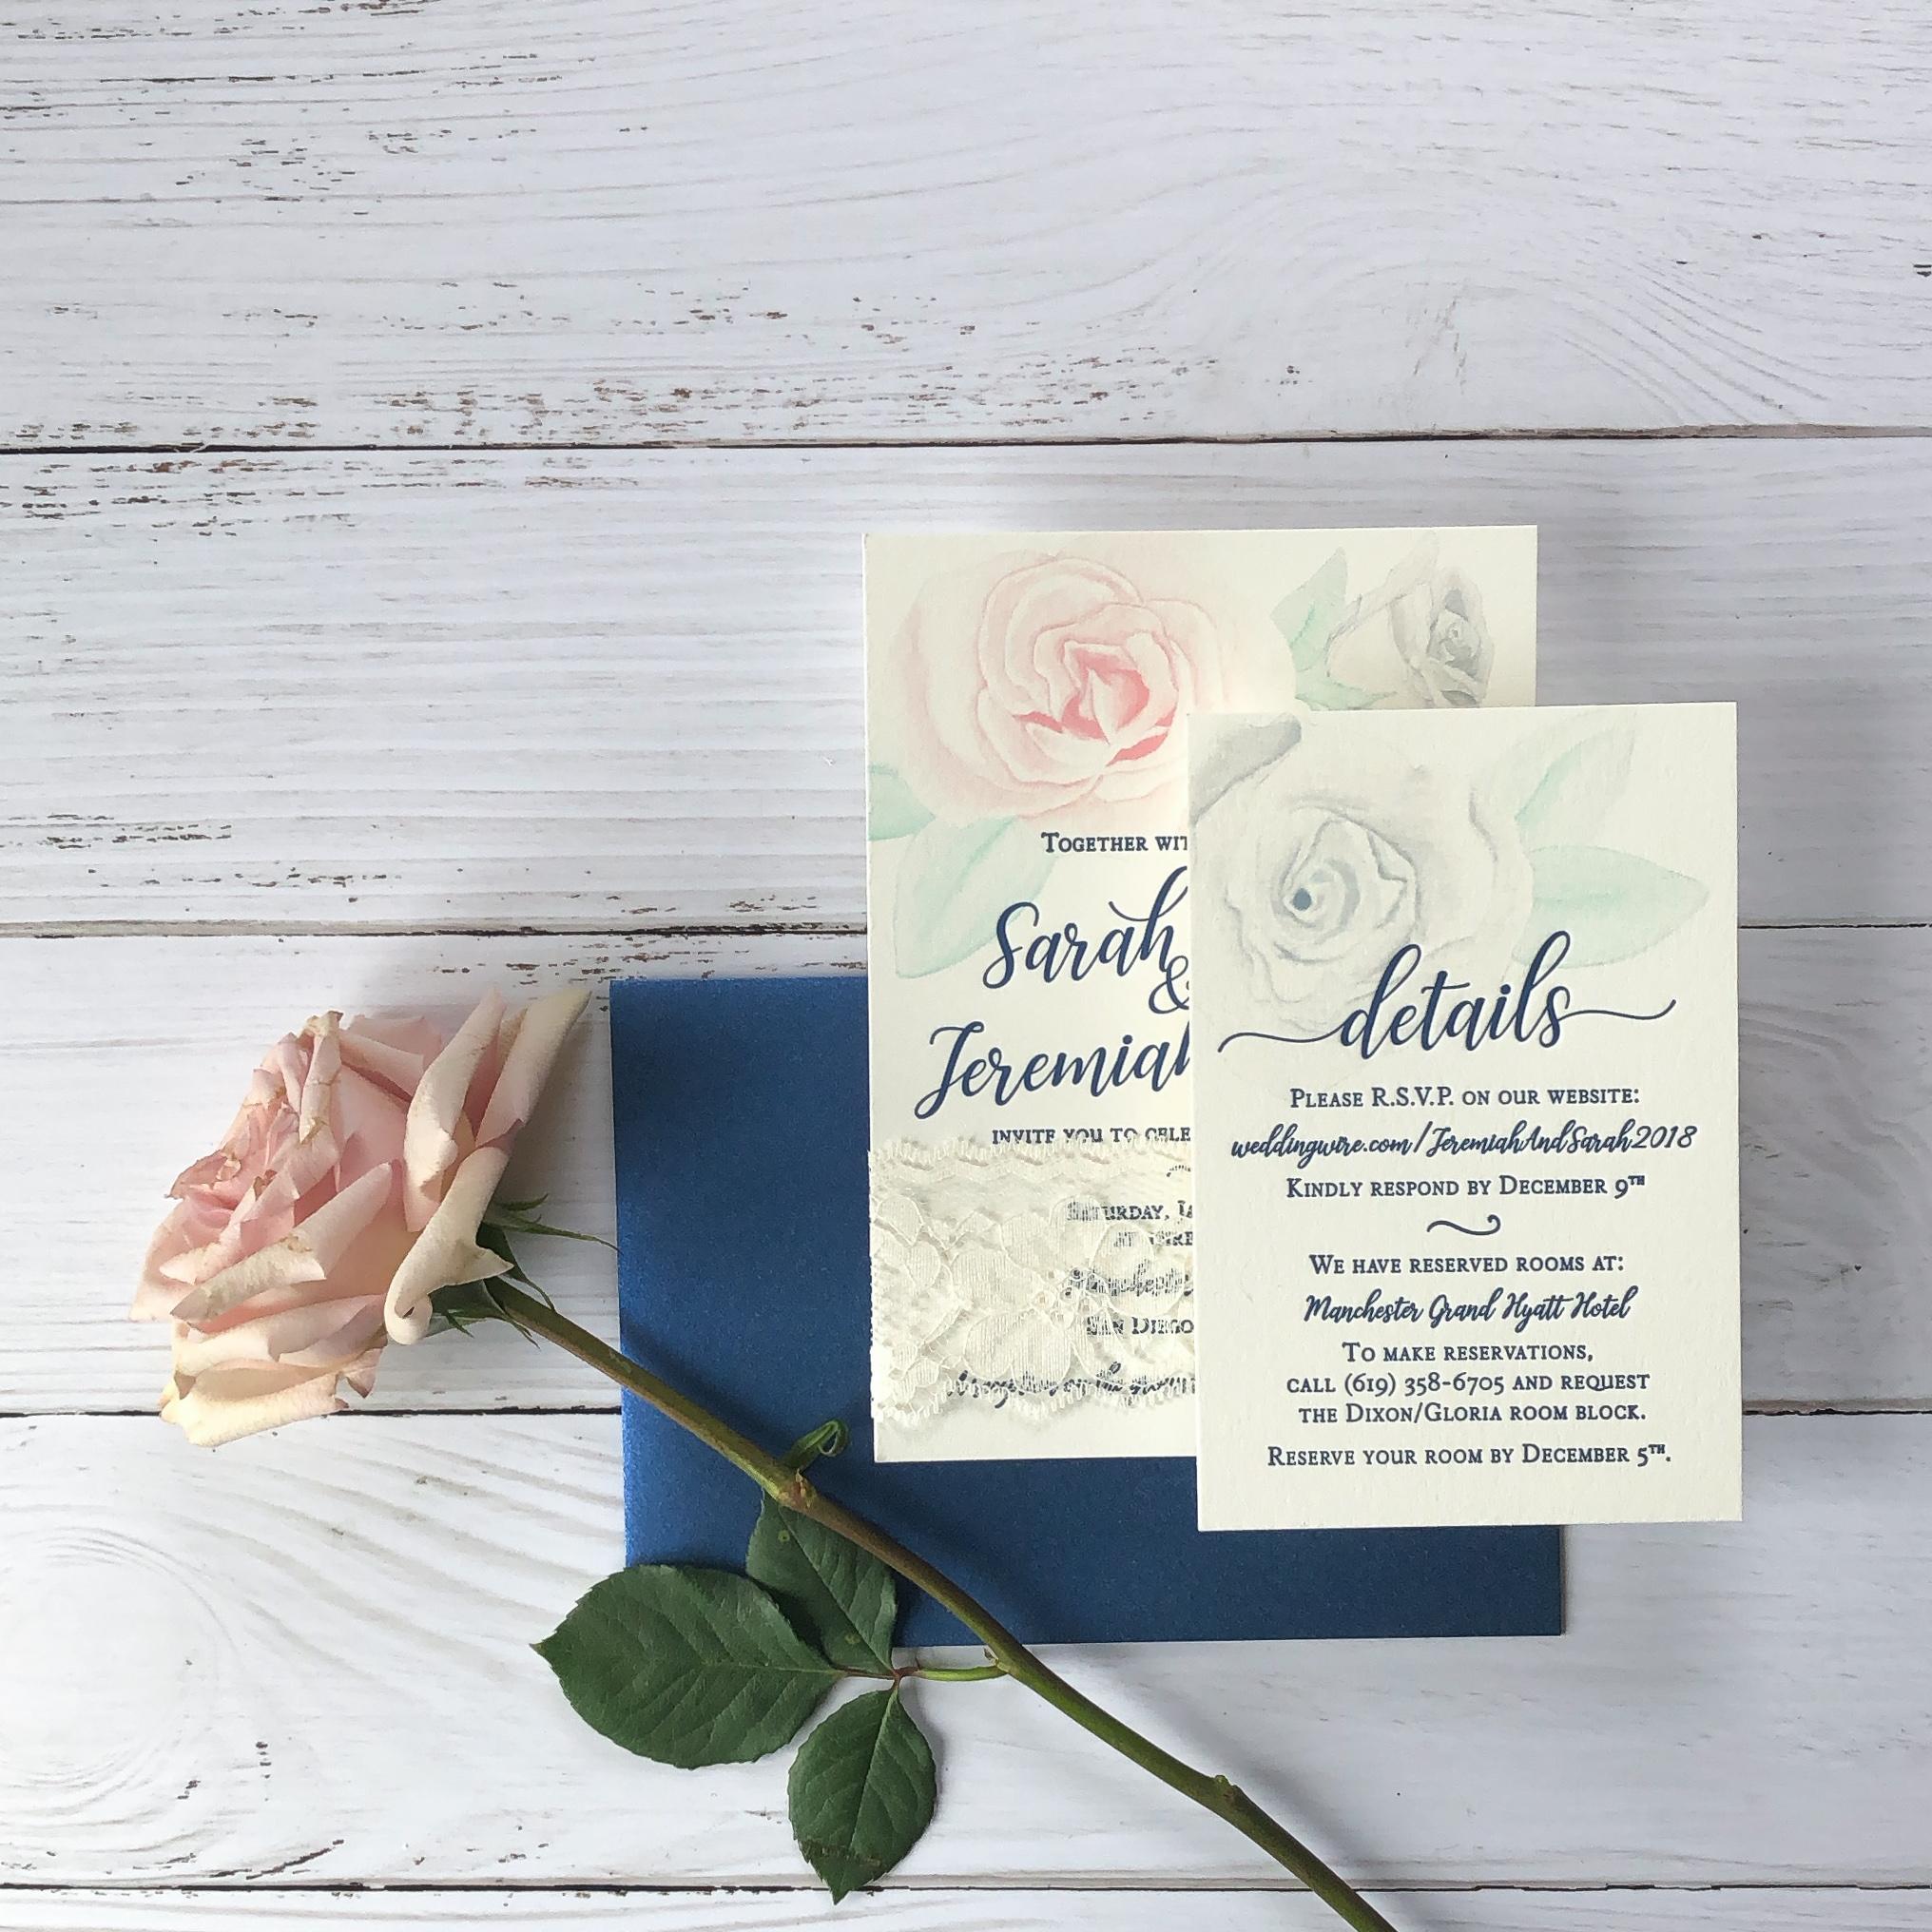 TypeA_RomanticRose_Winter_Wedding-Letterpress-InvitationSuite.jpg